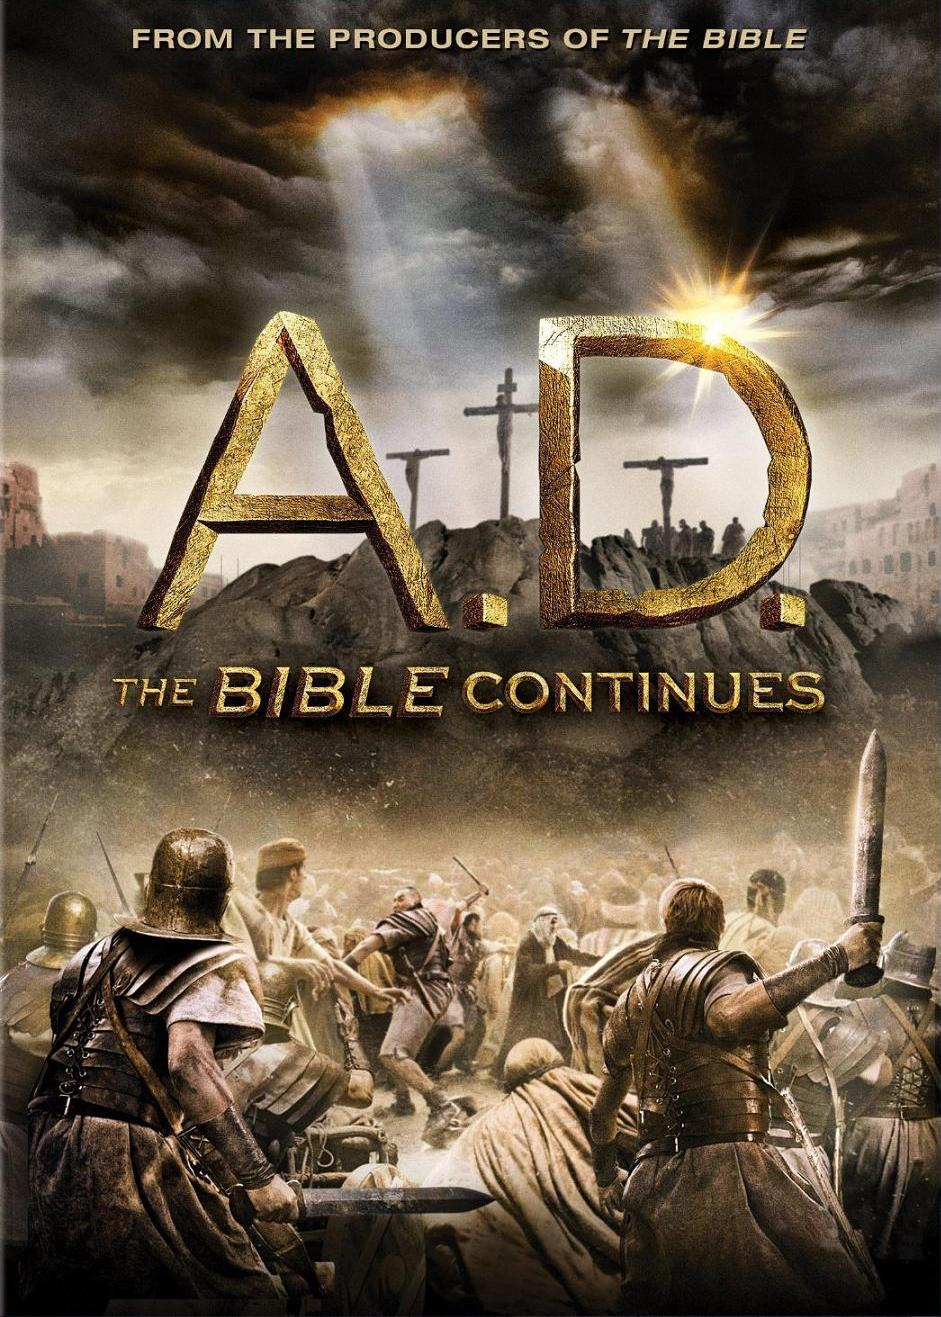 D.C.: La Biblia continúa